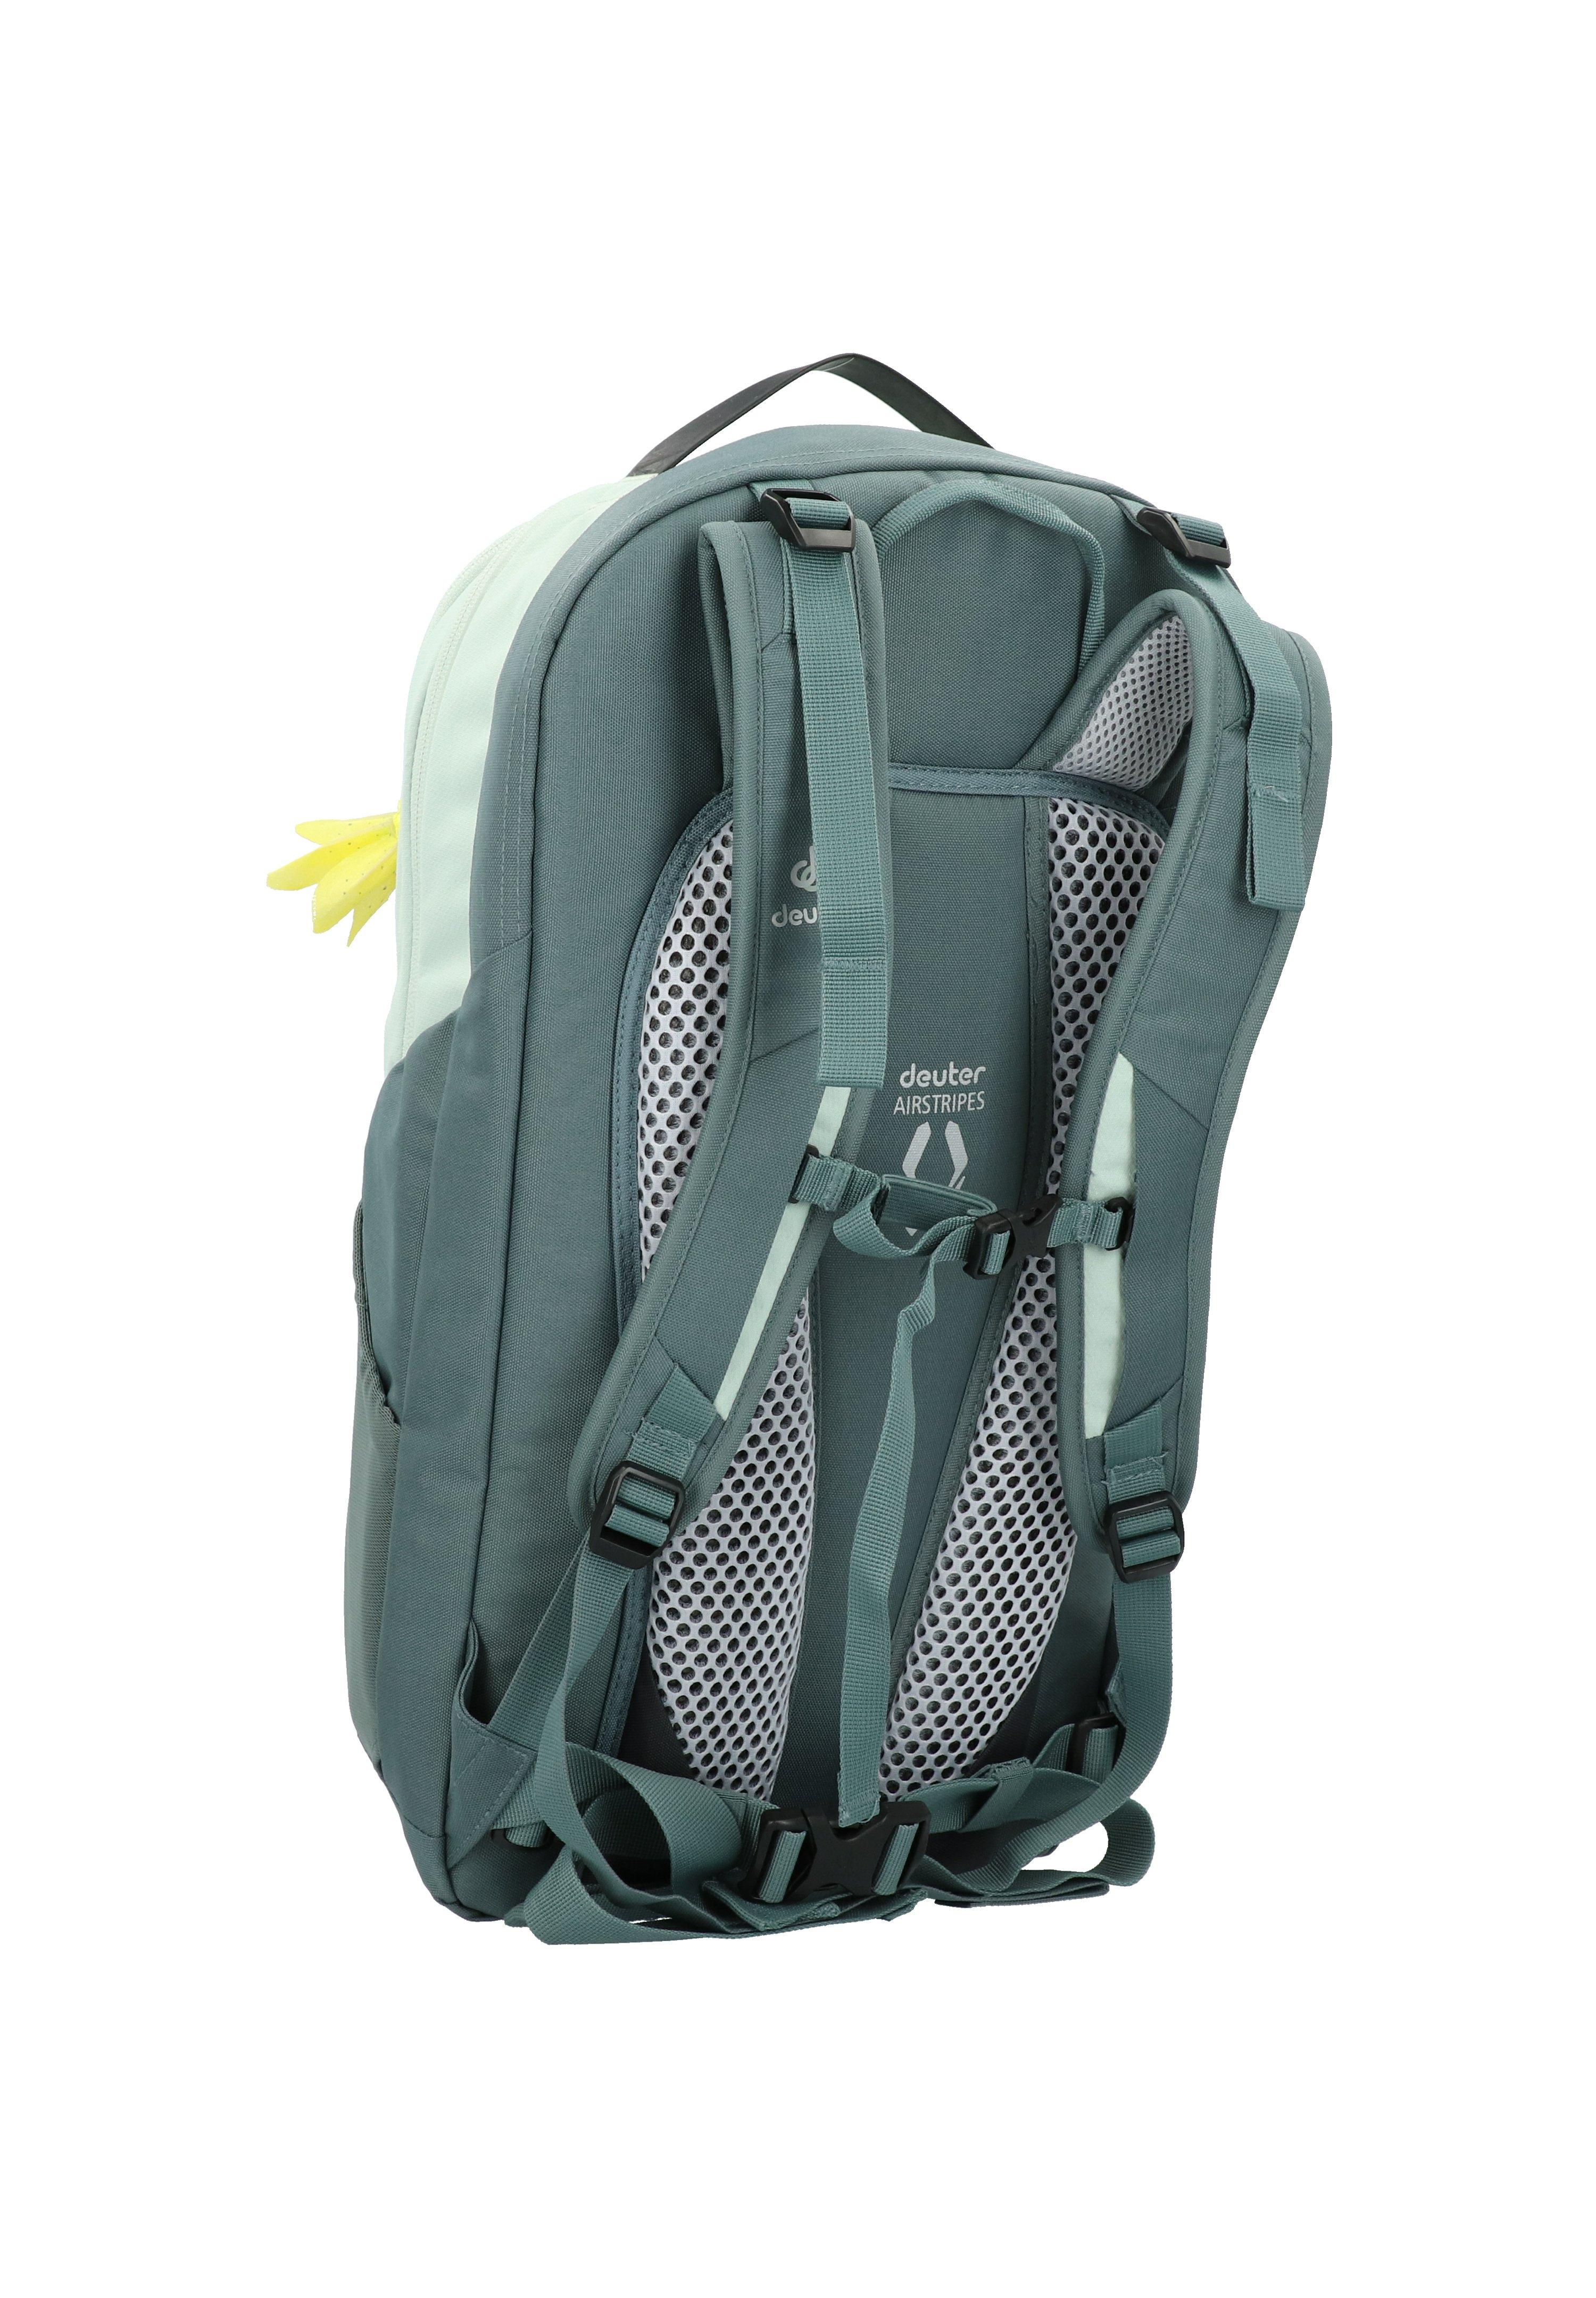 Deuter Xv 2 Sl Rucksack 52 Cm Laptopfach - Tagesrucksack Frost-teal/grün